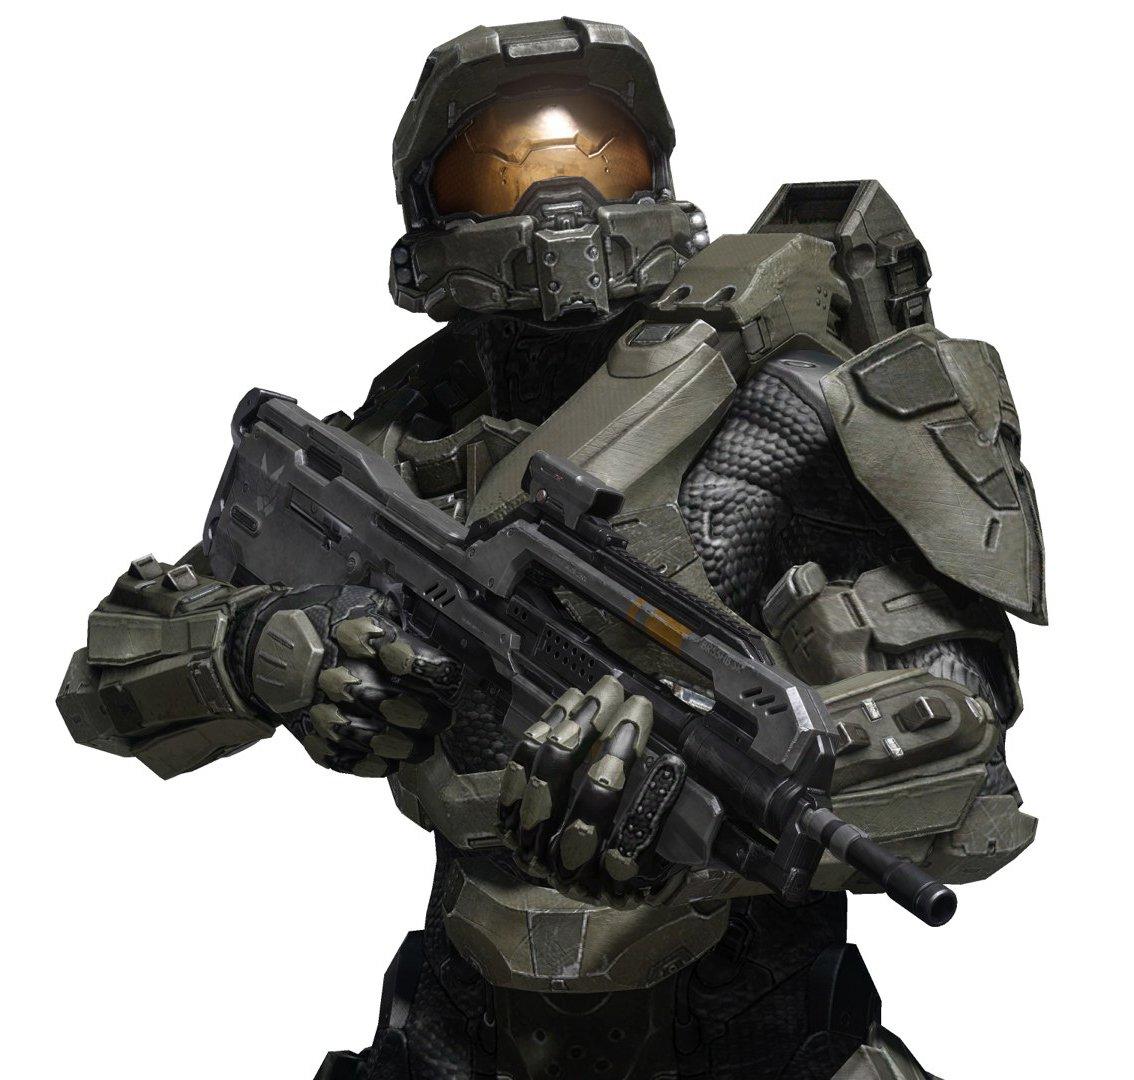 Halo-4-Master-Chief-Halo-30585561-1920-1080.Jpg